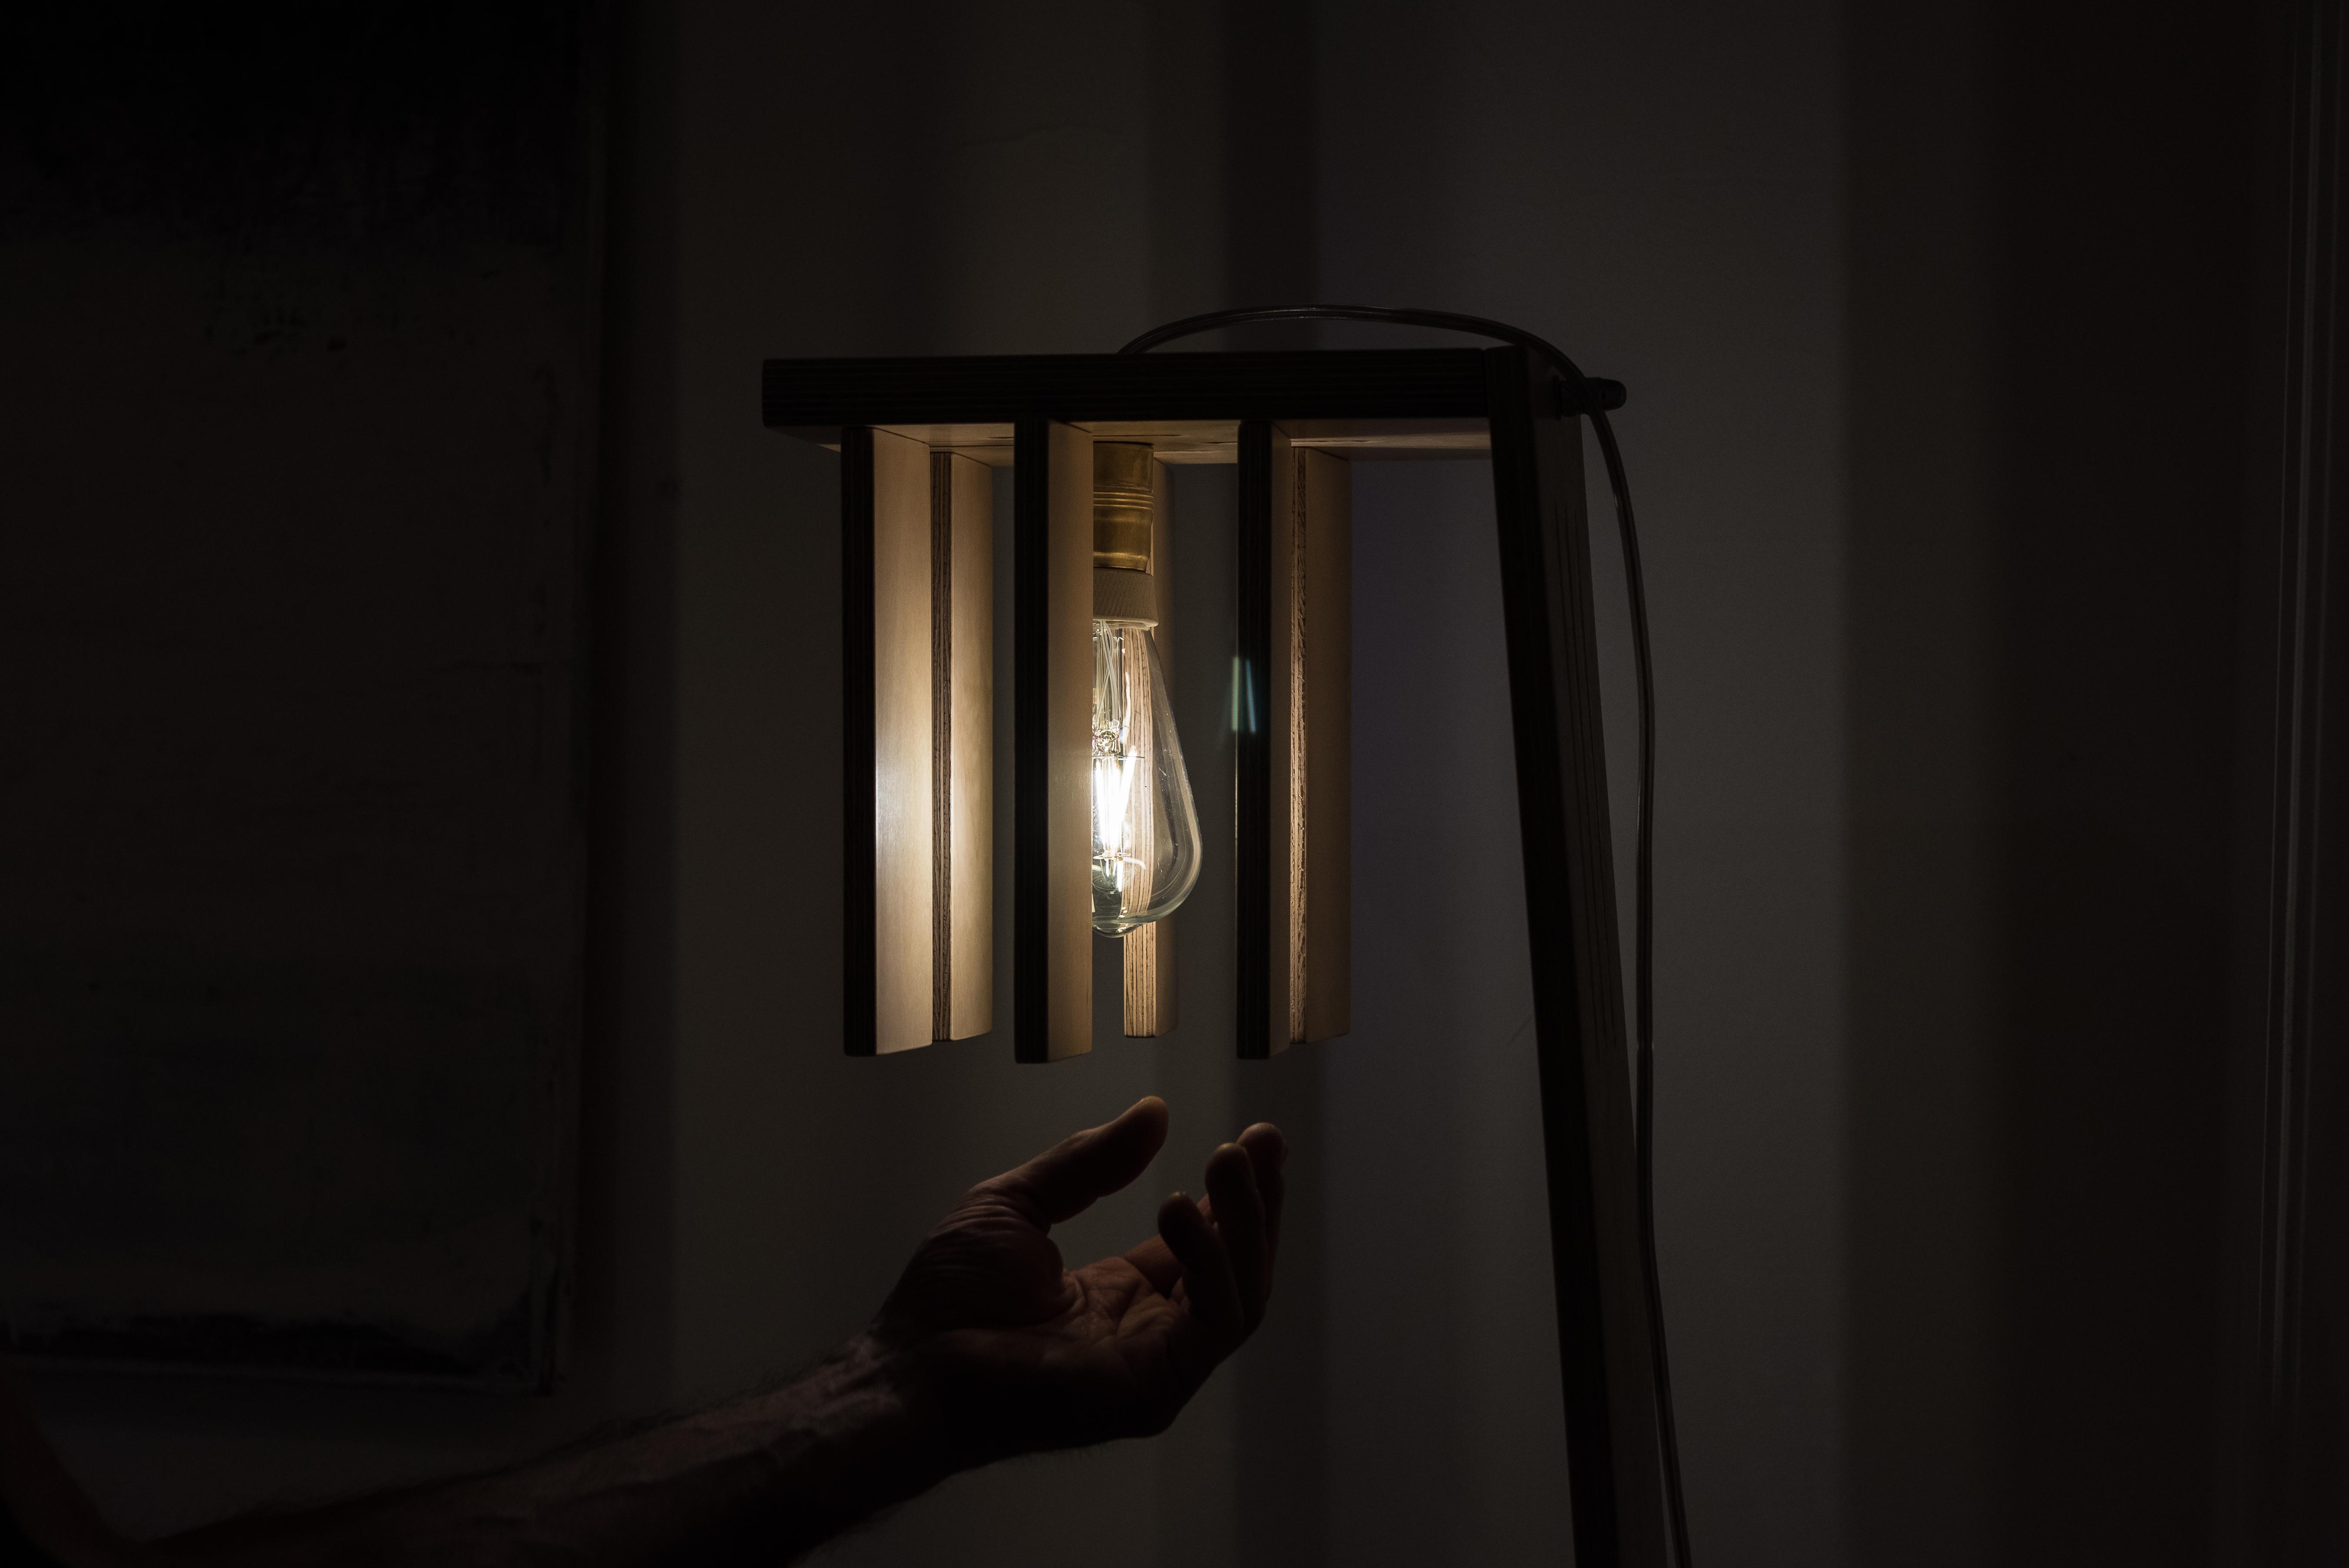 Lampa / Manufaktura69 Design